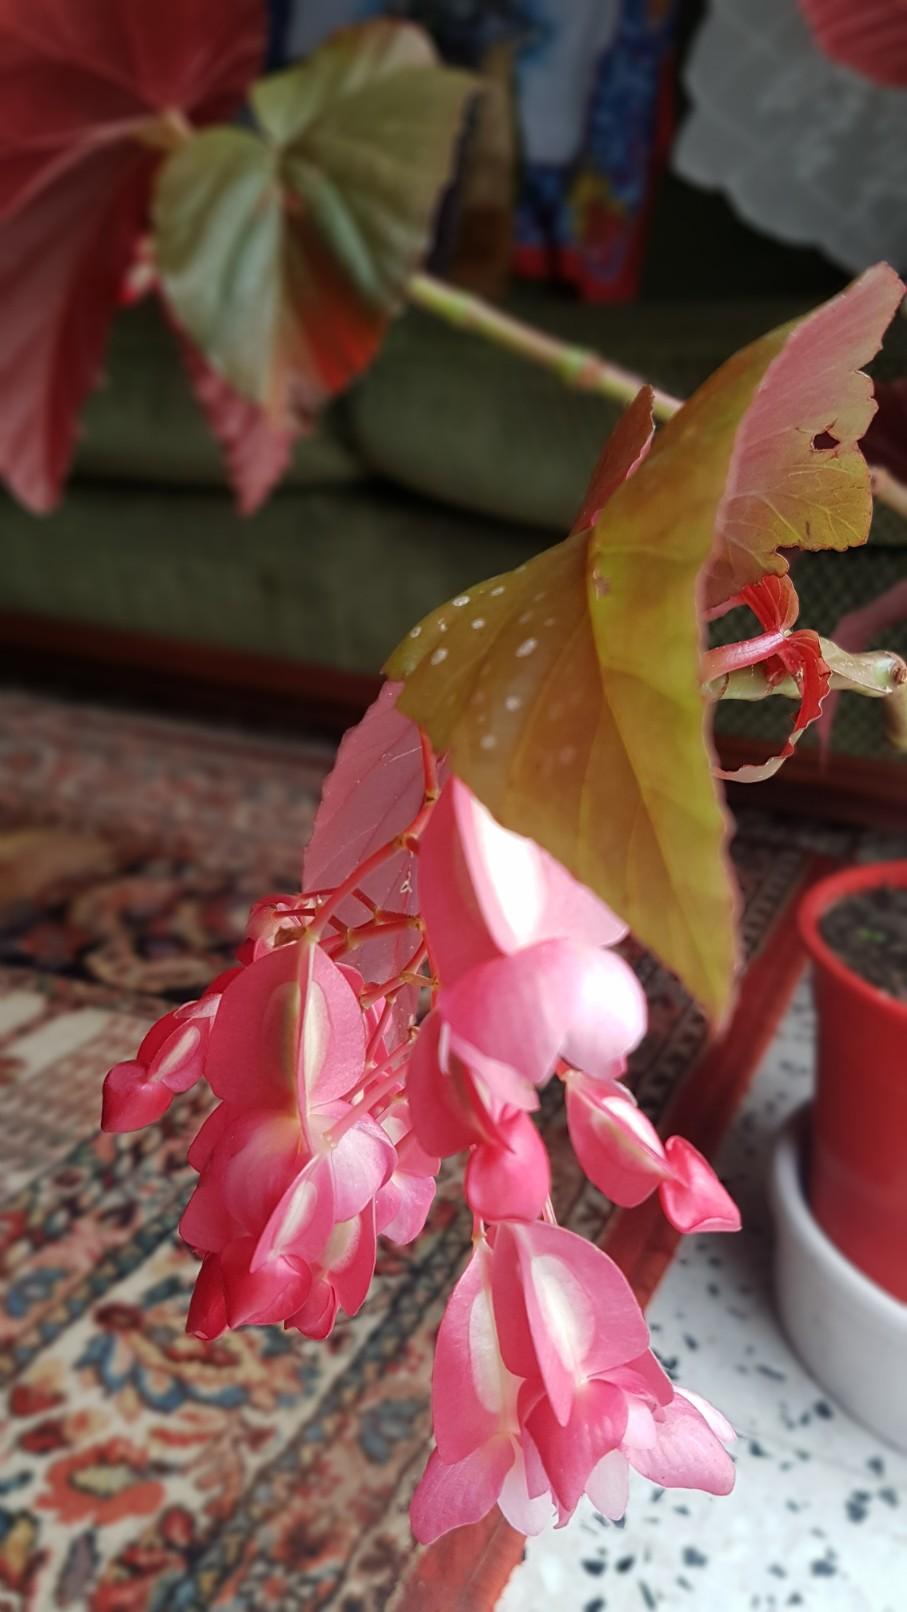 Begonia maculata et horticoles - bégonia bambou 20181174